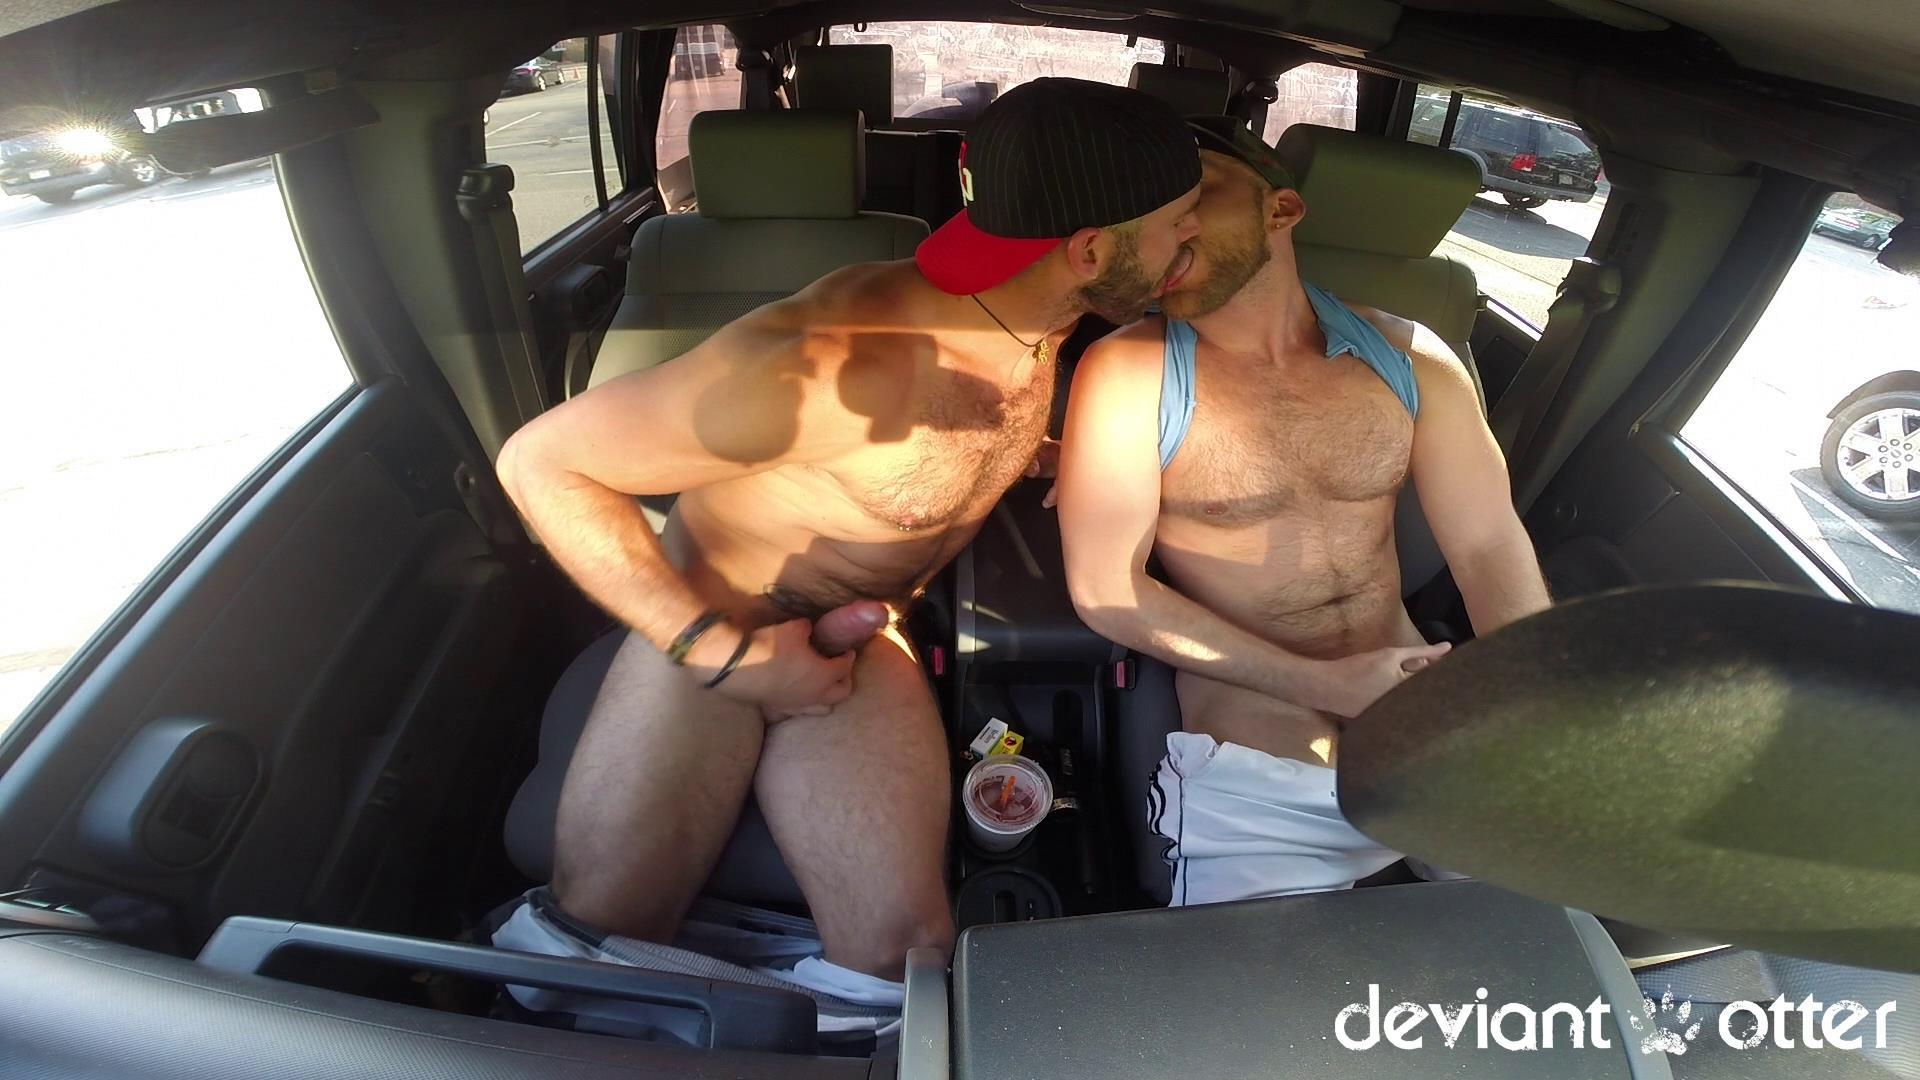 Deviant Otter Xavier Sucking Cock In Public Hairy Guys Amateur Gay Porn 12